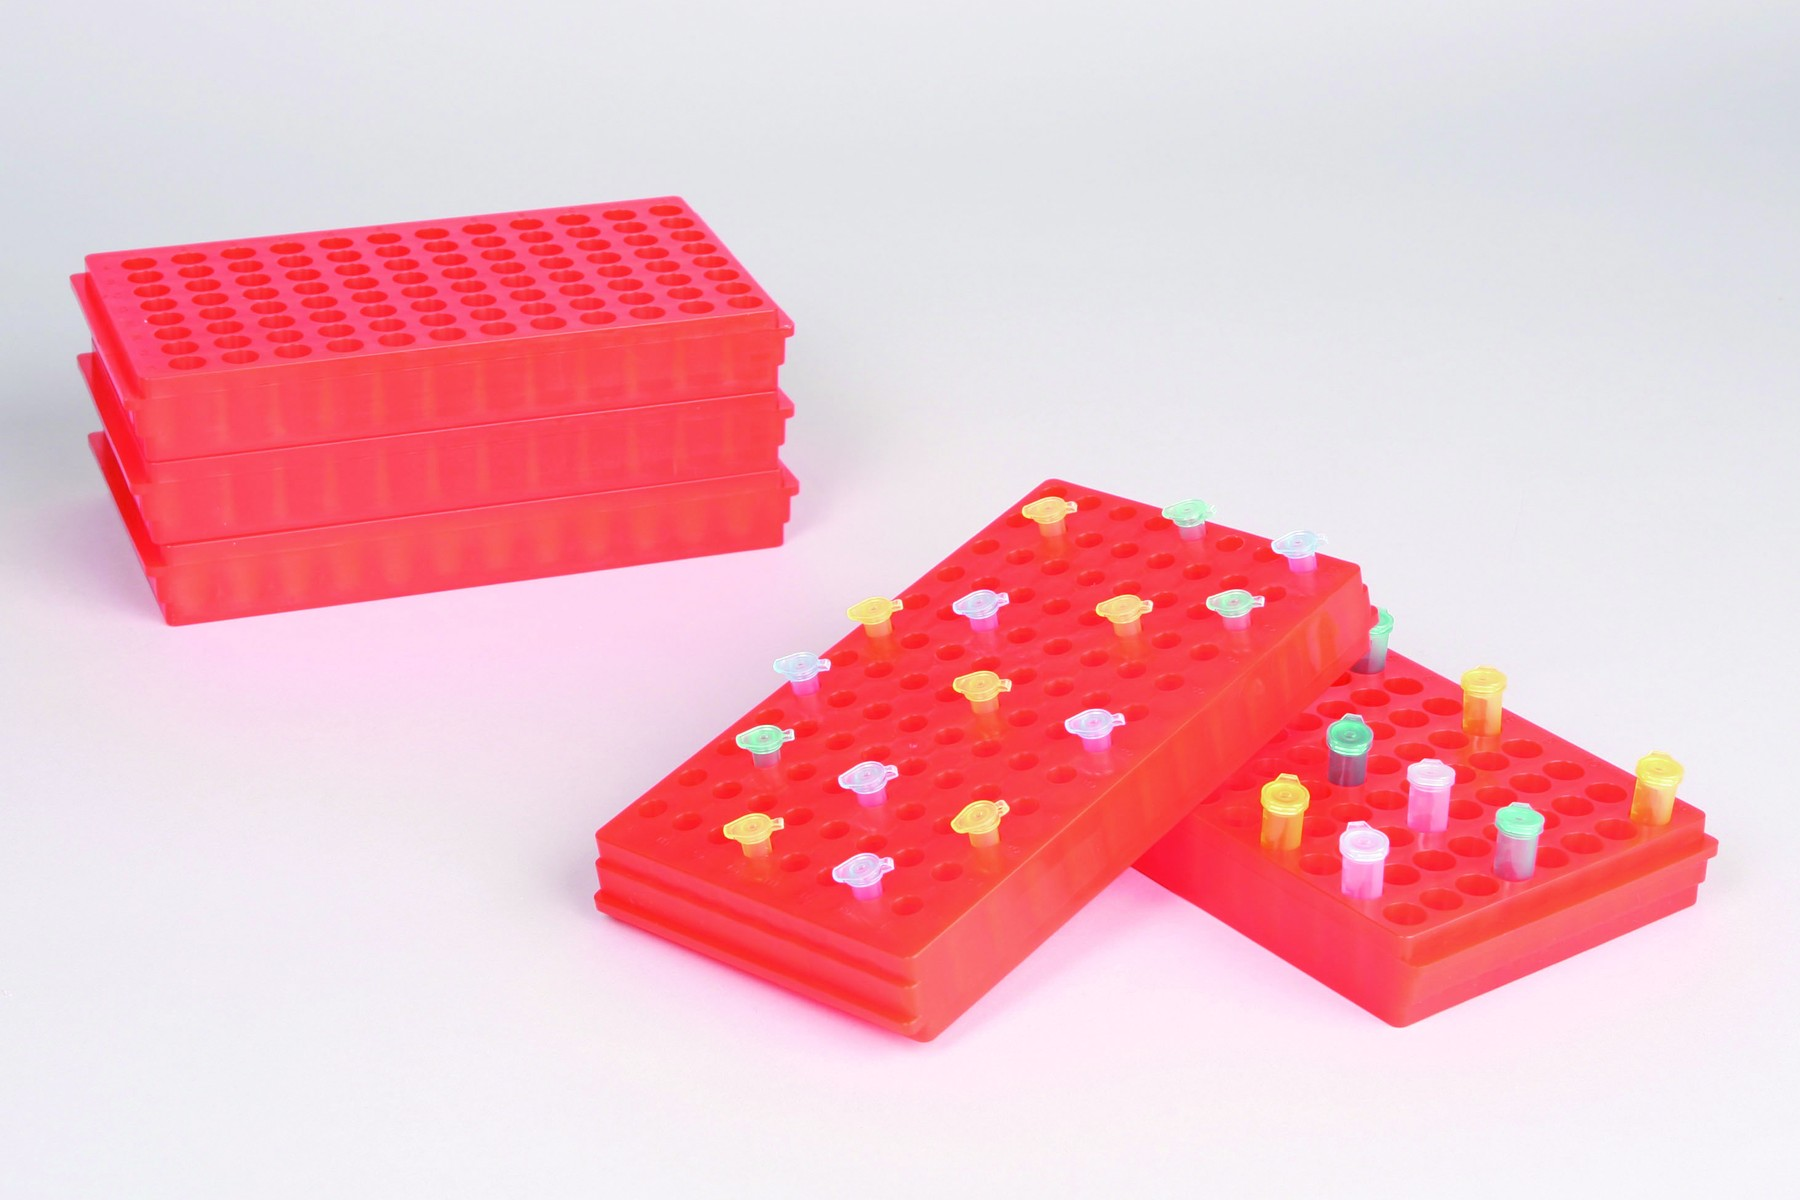 SP Bel-Art Microcentrifuge Tube Rack; For 0.5 or 1.5-2.0ml Tubes, 96 Places, Orange (Pack of 5)